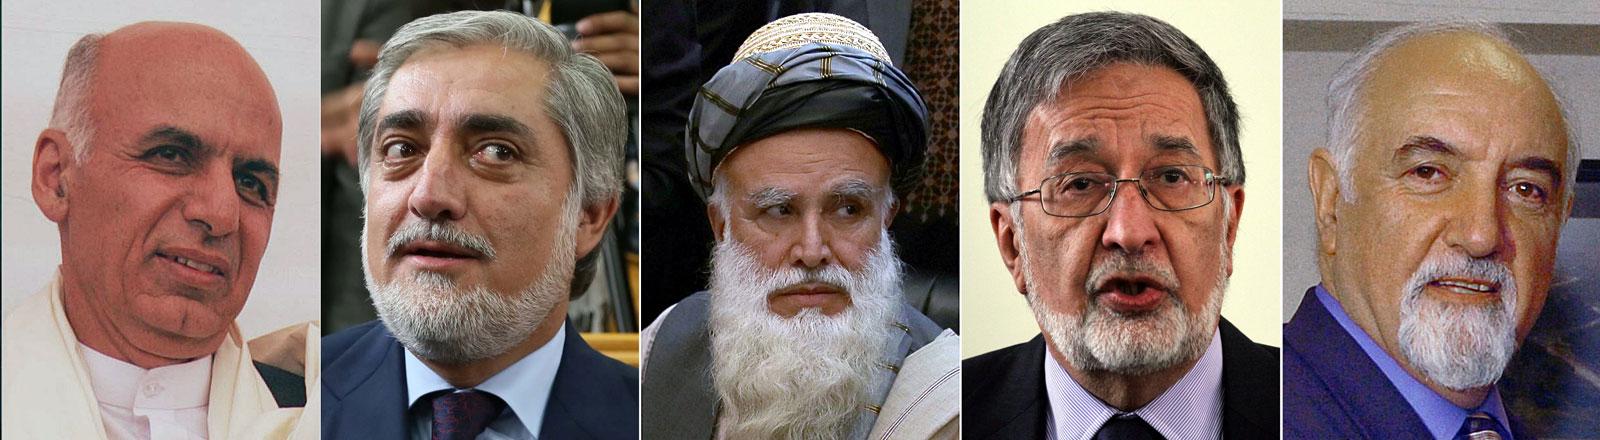 Einige der Bewerber für das Präsidentenamt in Afghanistan (v.l.n.r.): Ashraf Ghani Ahmadzai, Abdullah Abdullah, Abdul Rab Rasool Sayyaf, Zalmai Rassoul, Hedayat Amin Arsalah